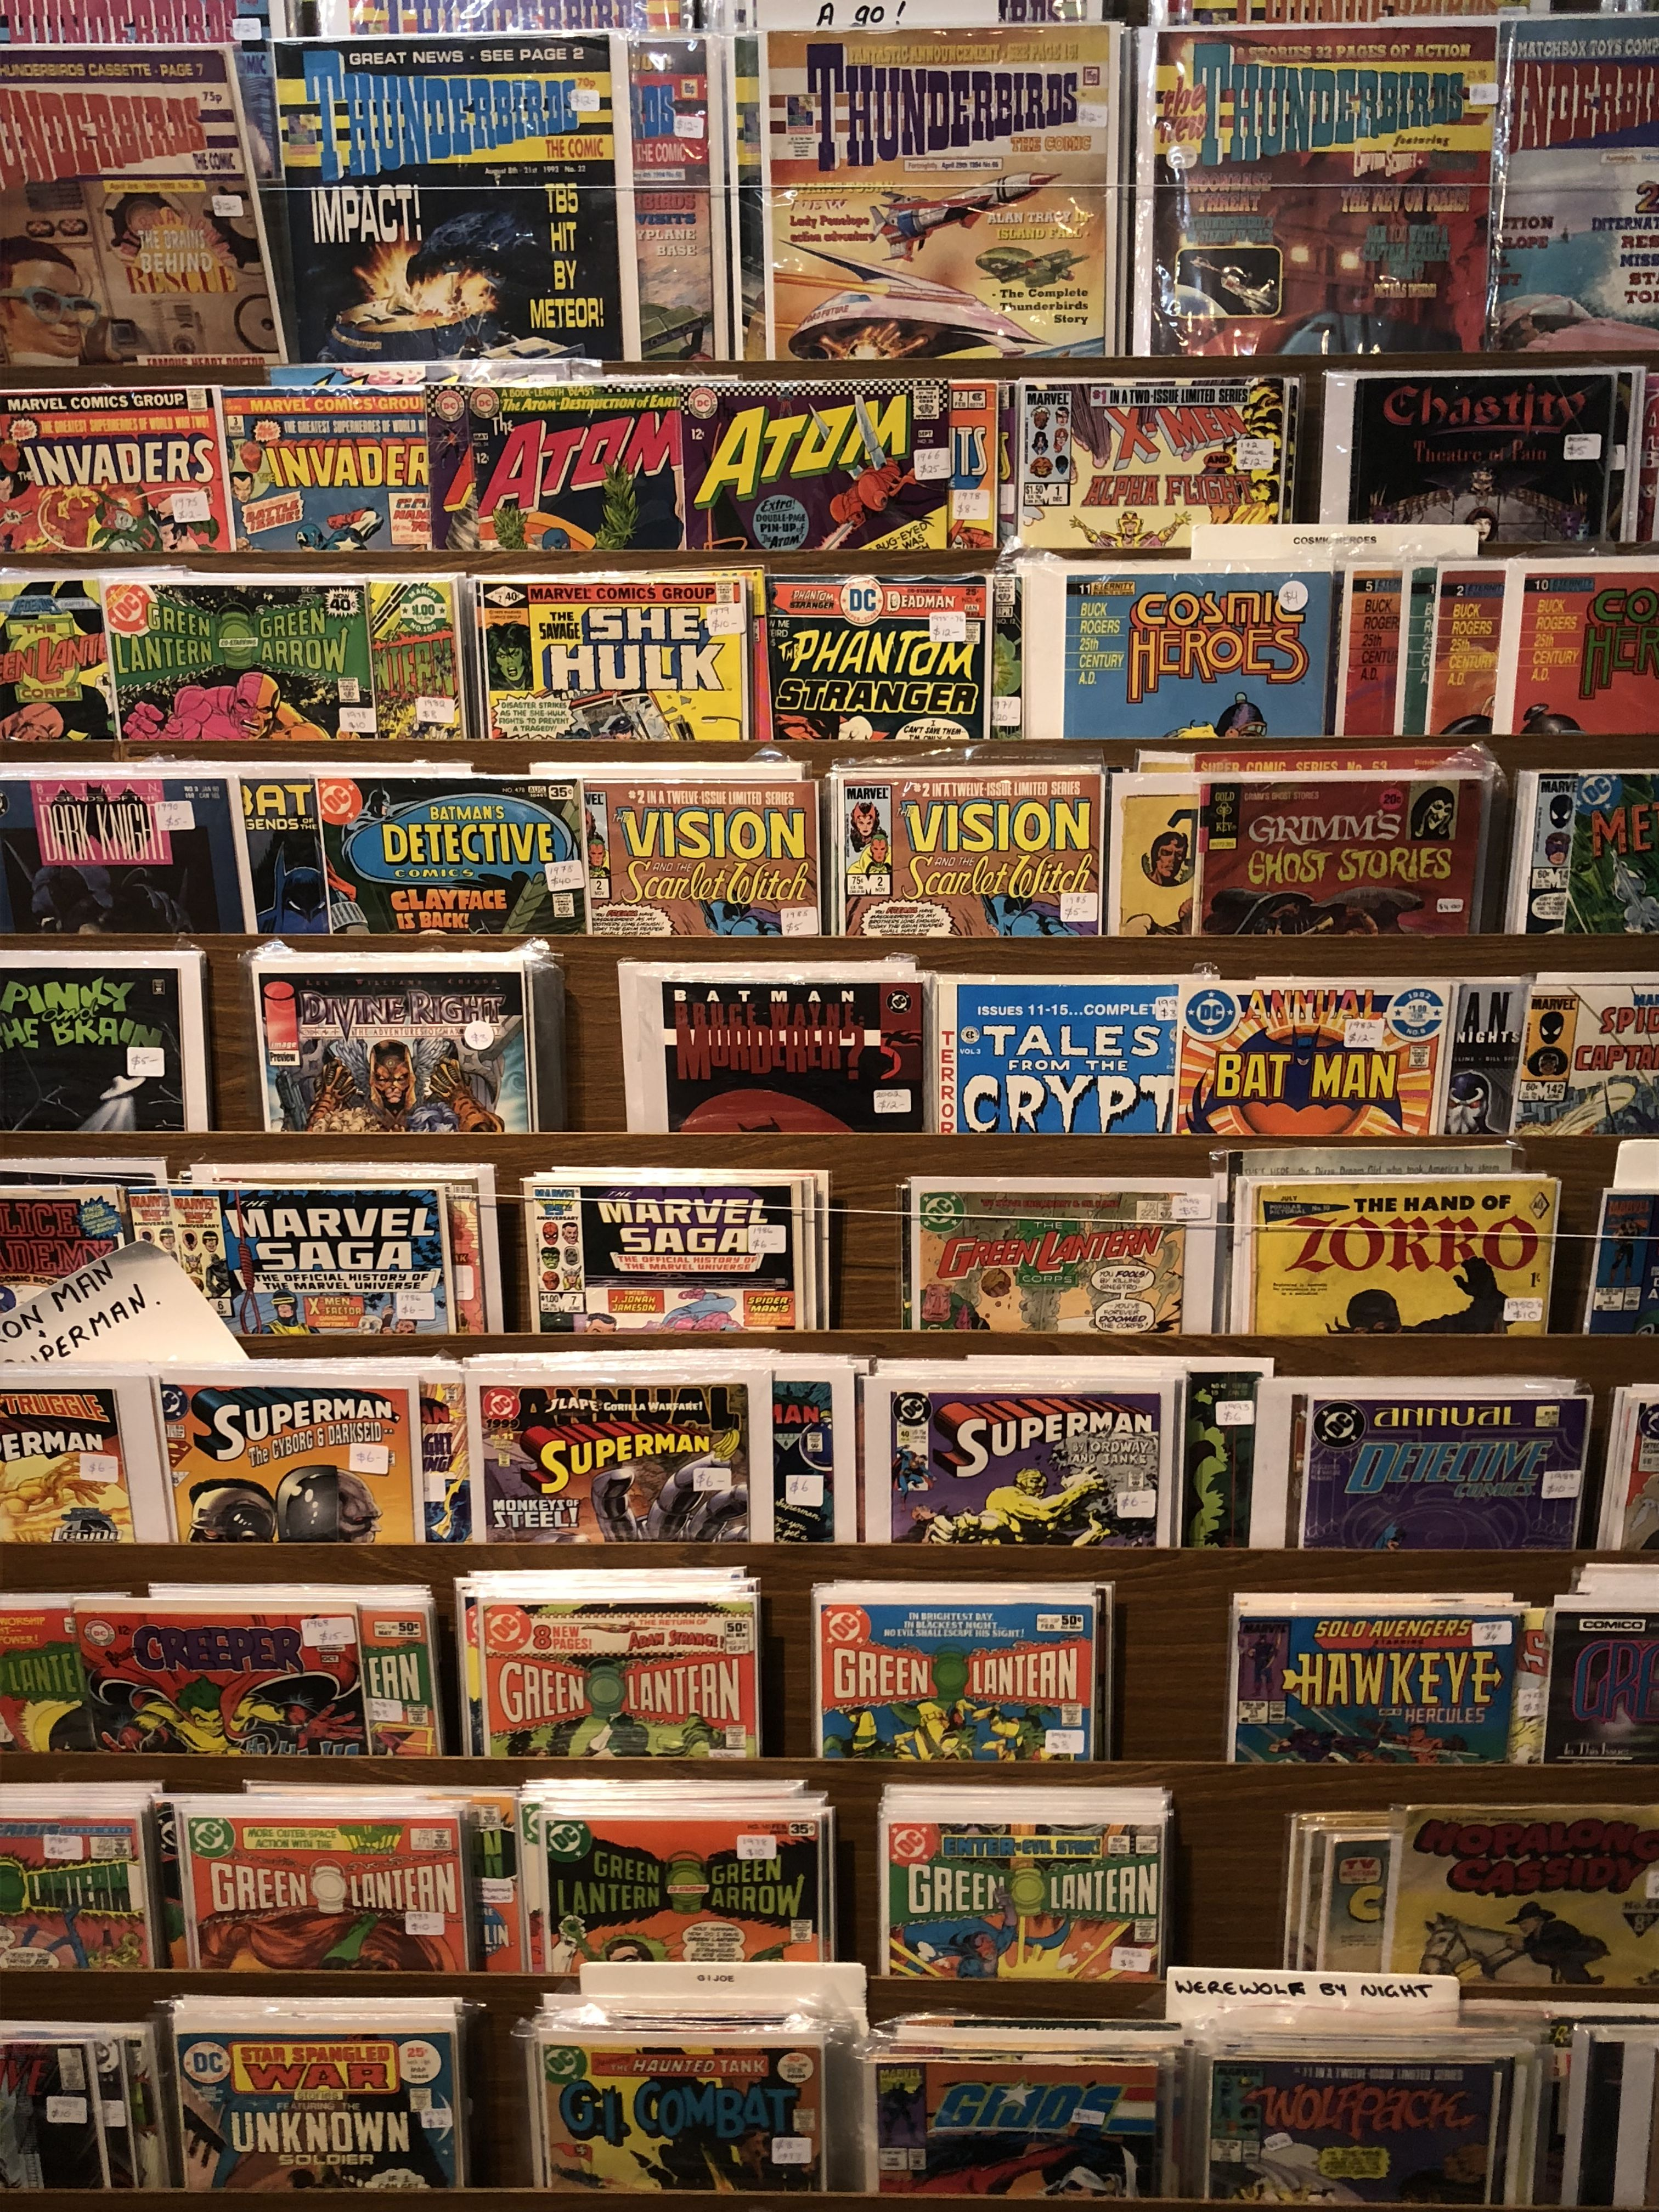 Aesthetic 80s Comics Vintage 80s Retro 80scomics Aesthetic 90s Comics Marvel Dc 80saesthetic 90saes Comic Book Shop Book Aesthetic Light In The Dark